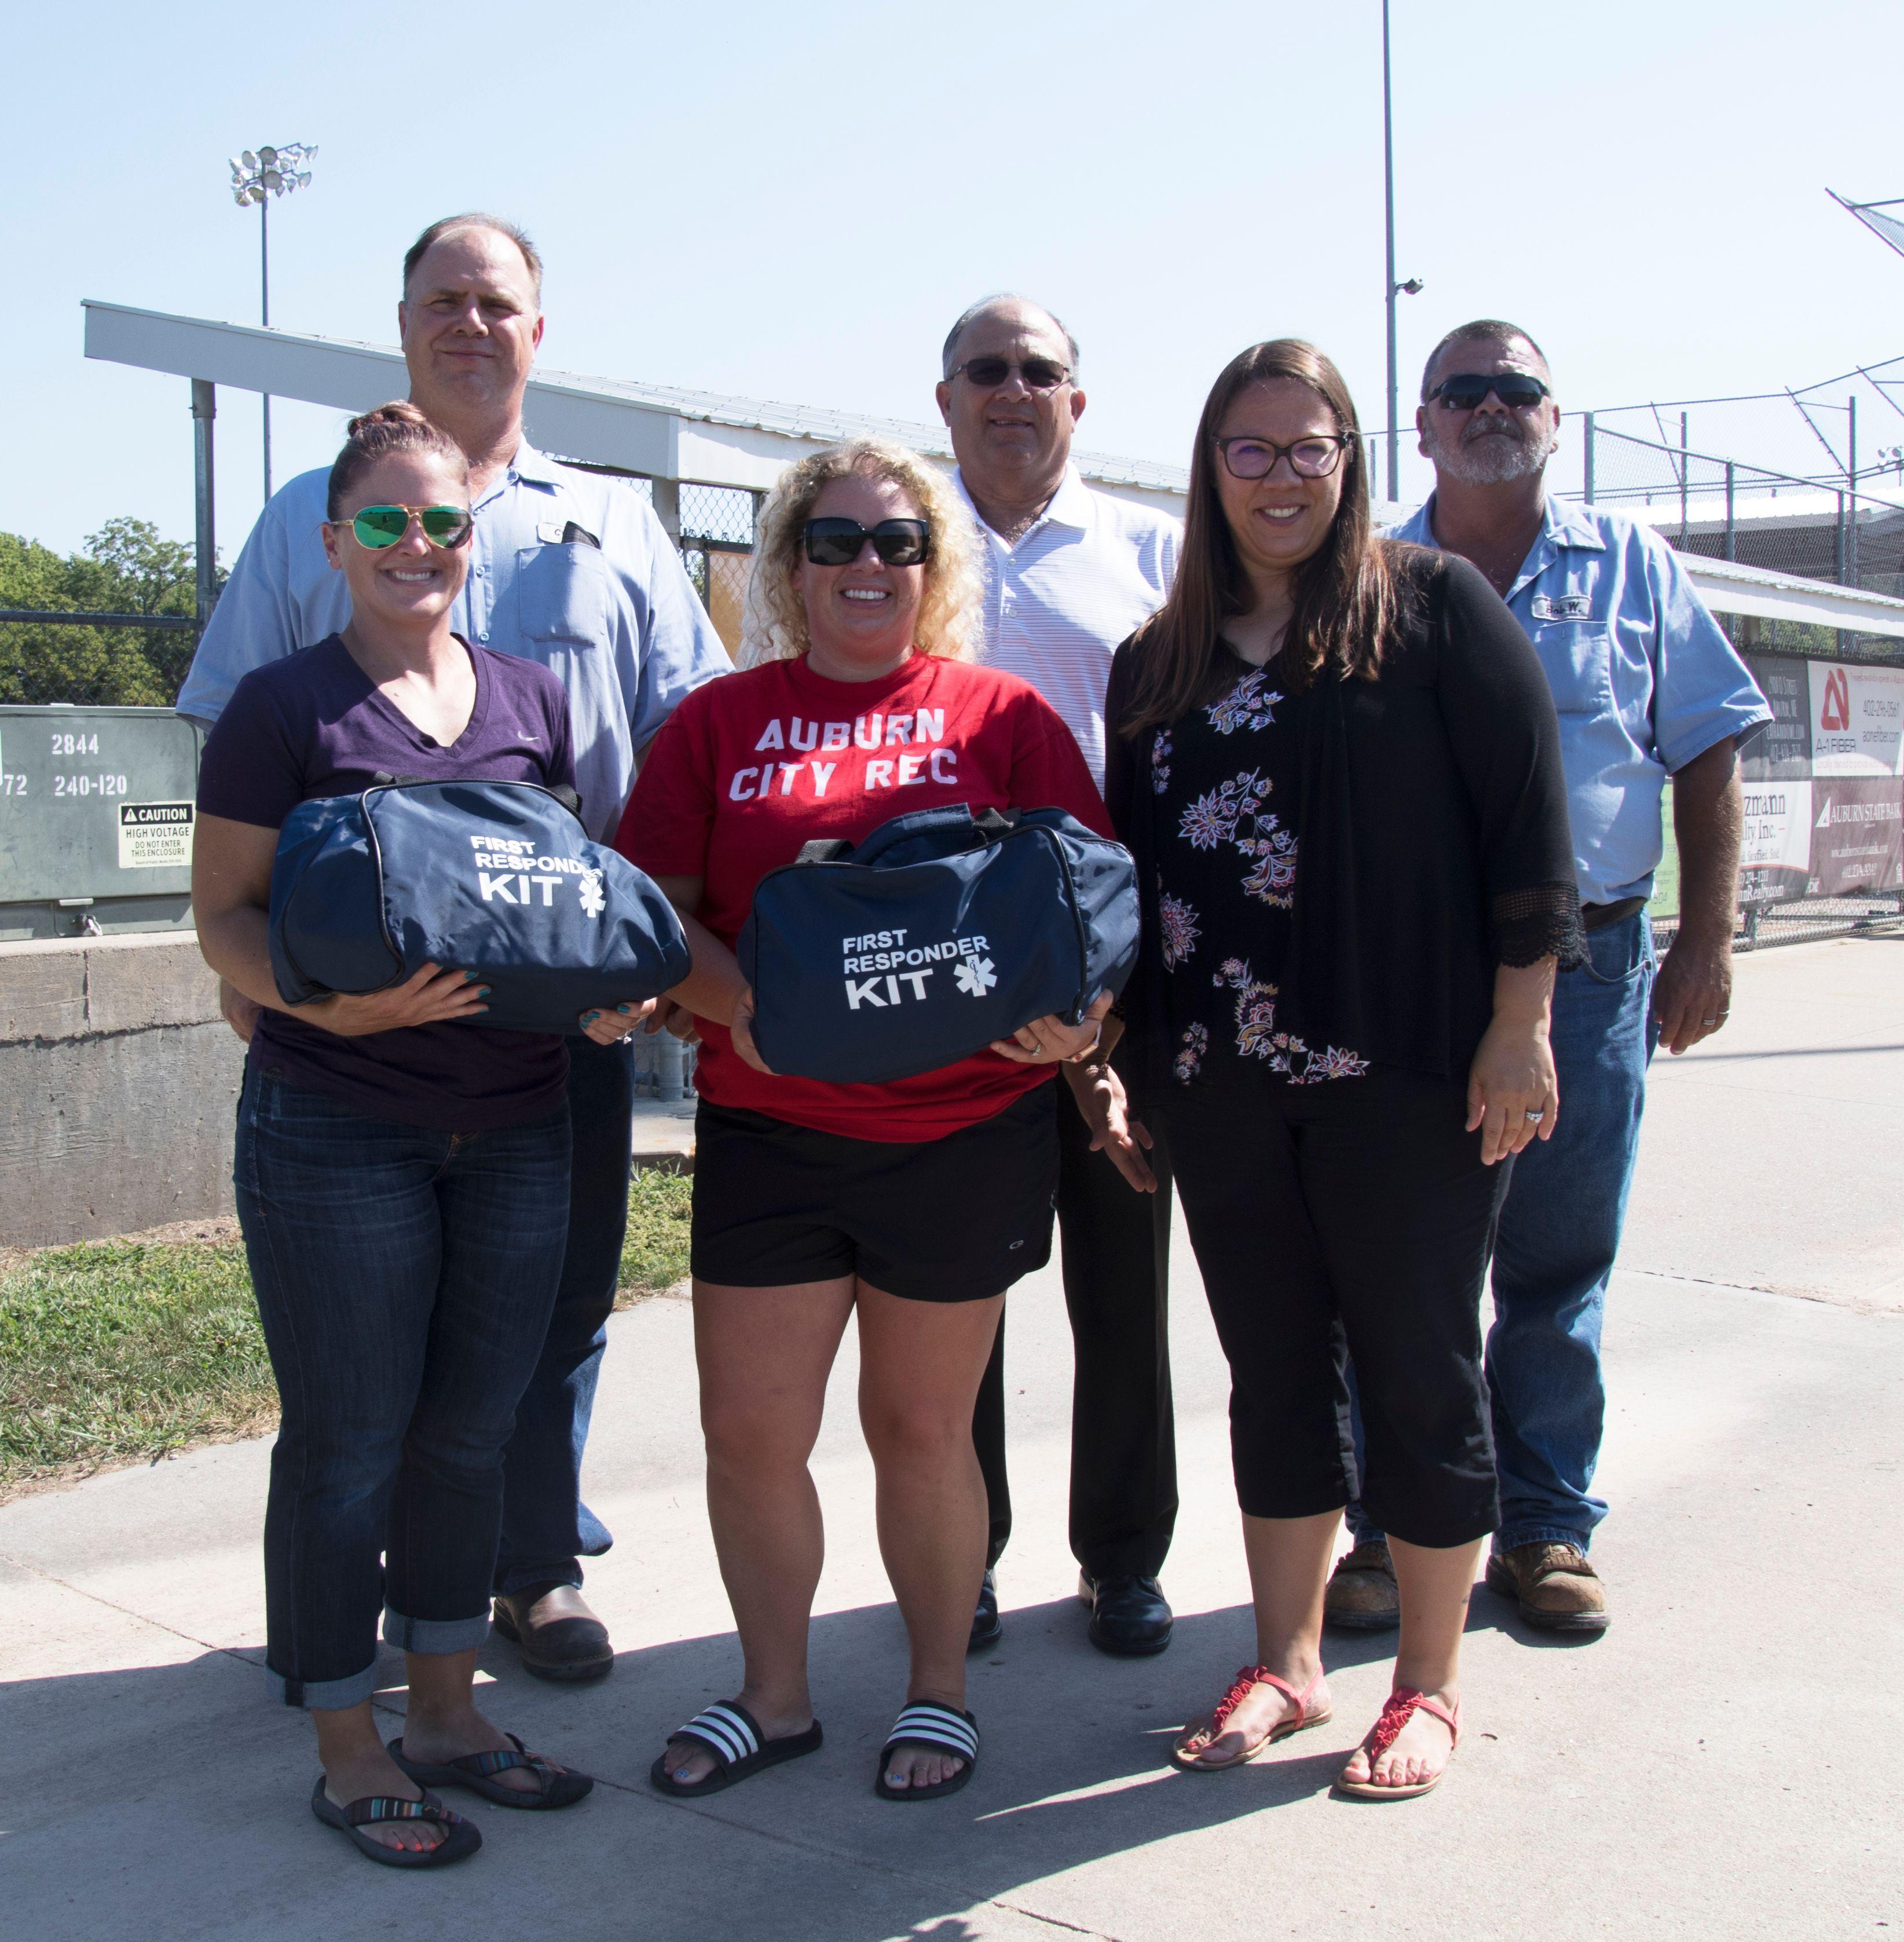 Auburn BPW Donates First Responder Kits to Complex